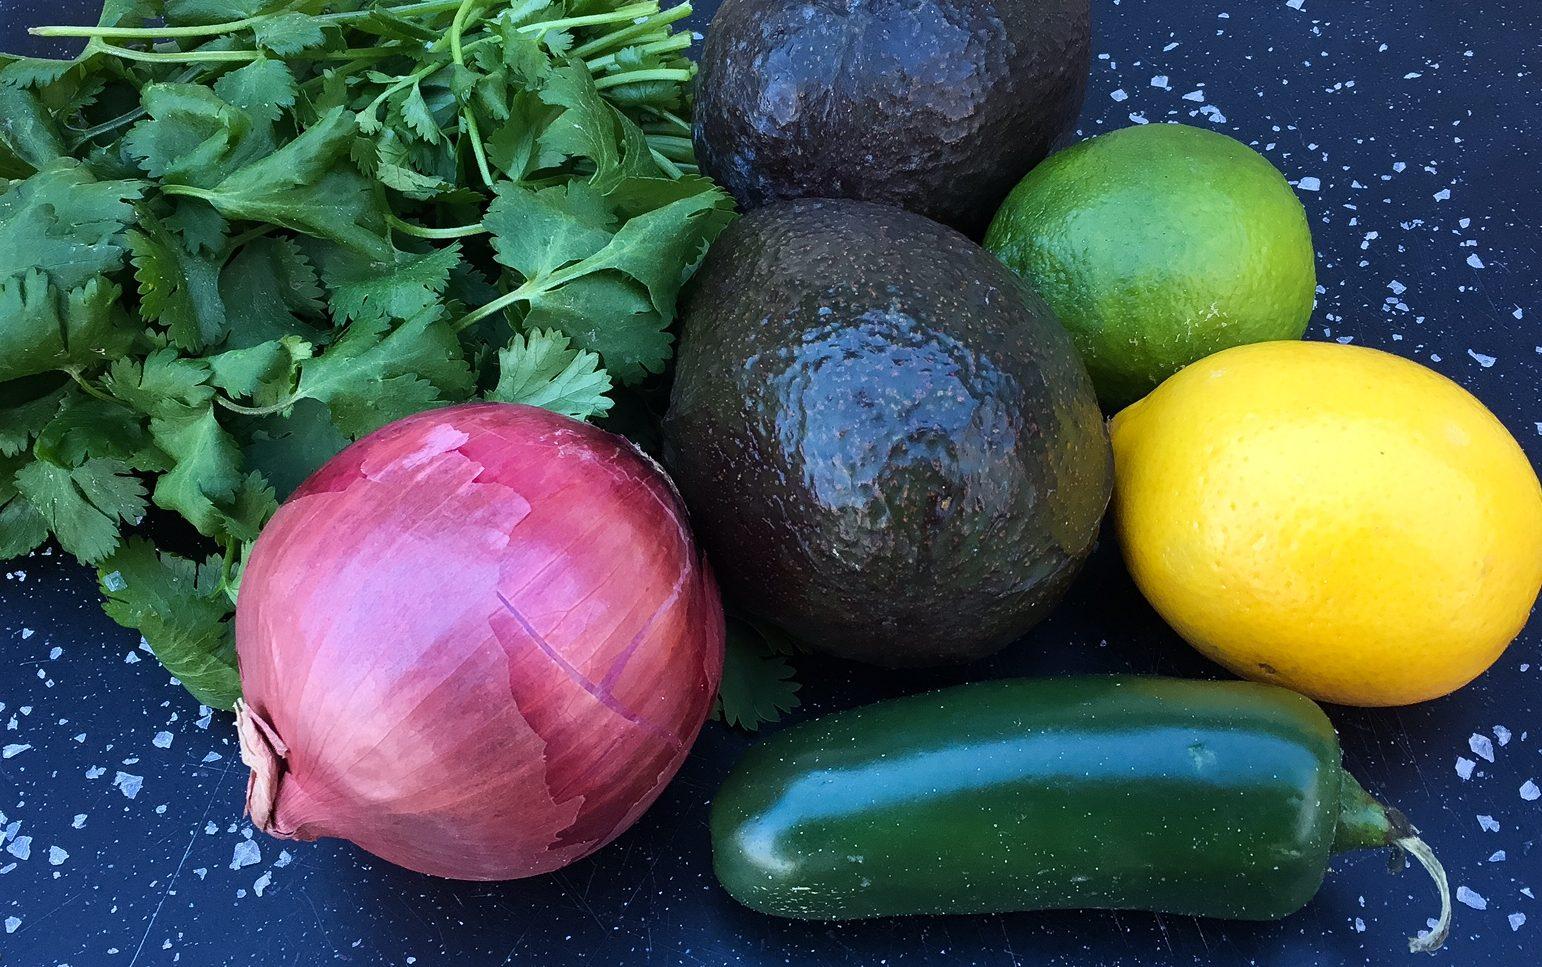 guacamole, avocado, chipotle, cilantro, mexican food, appetizer, cilantro, jalepeno, red onion